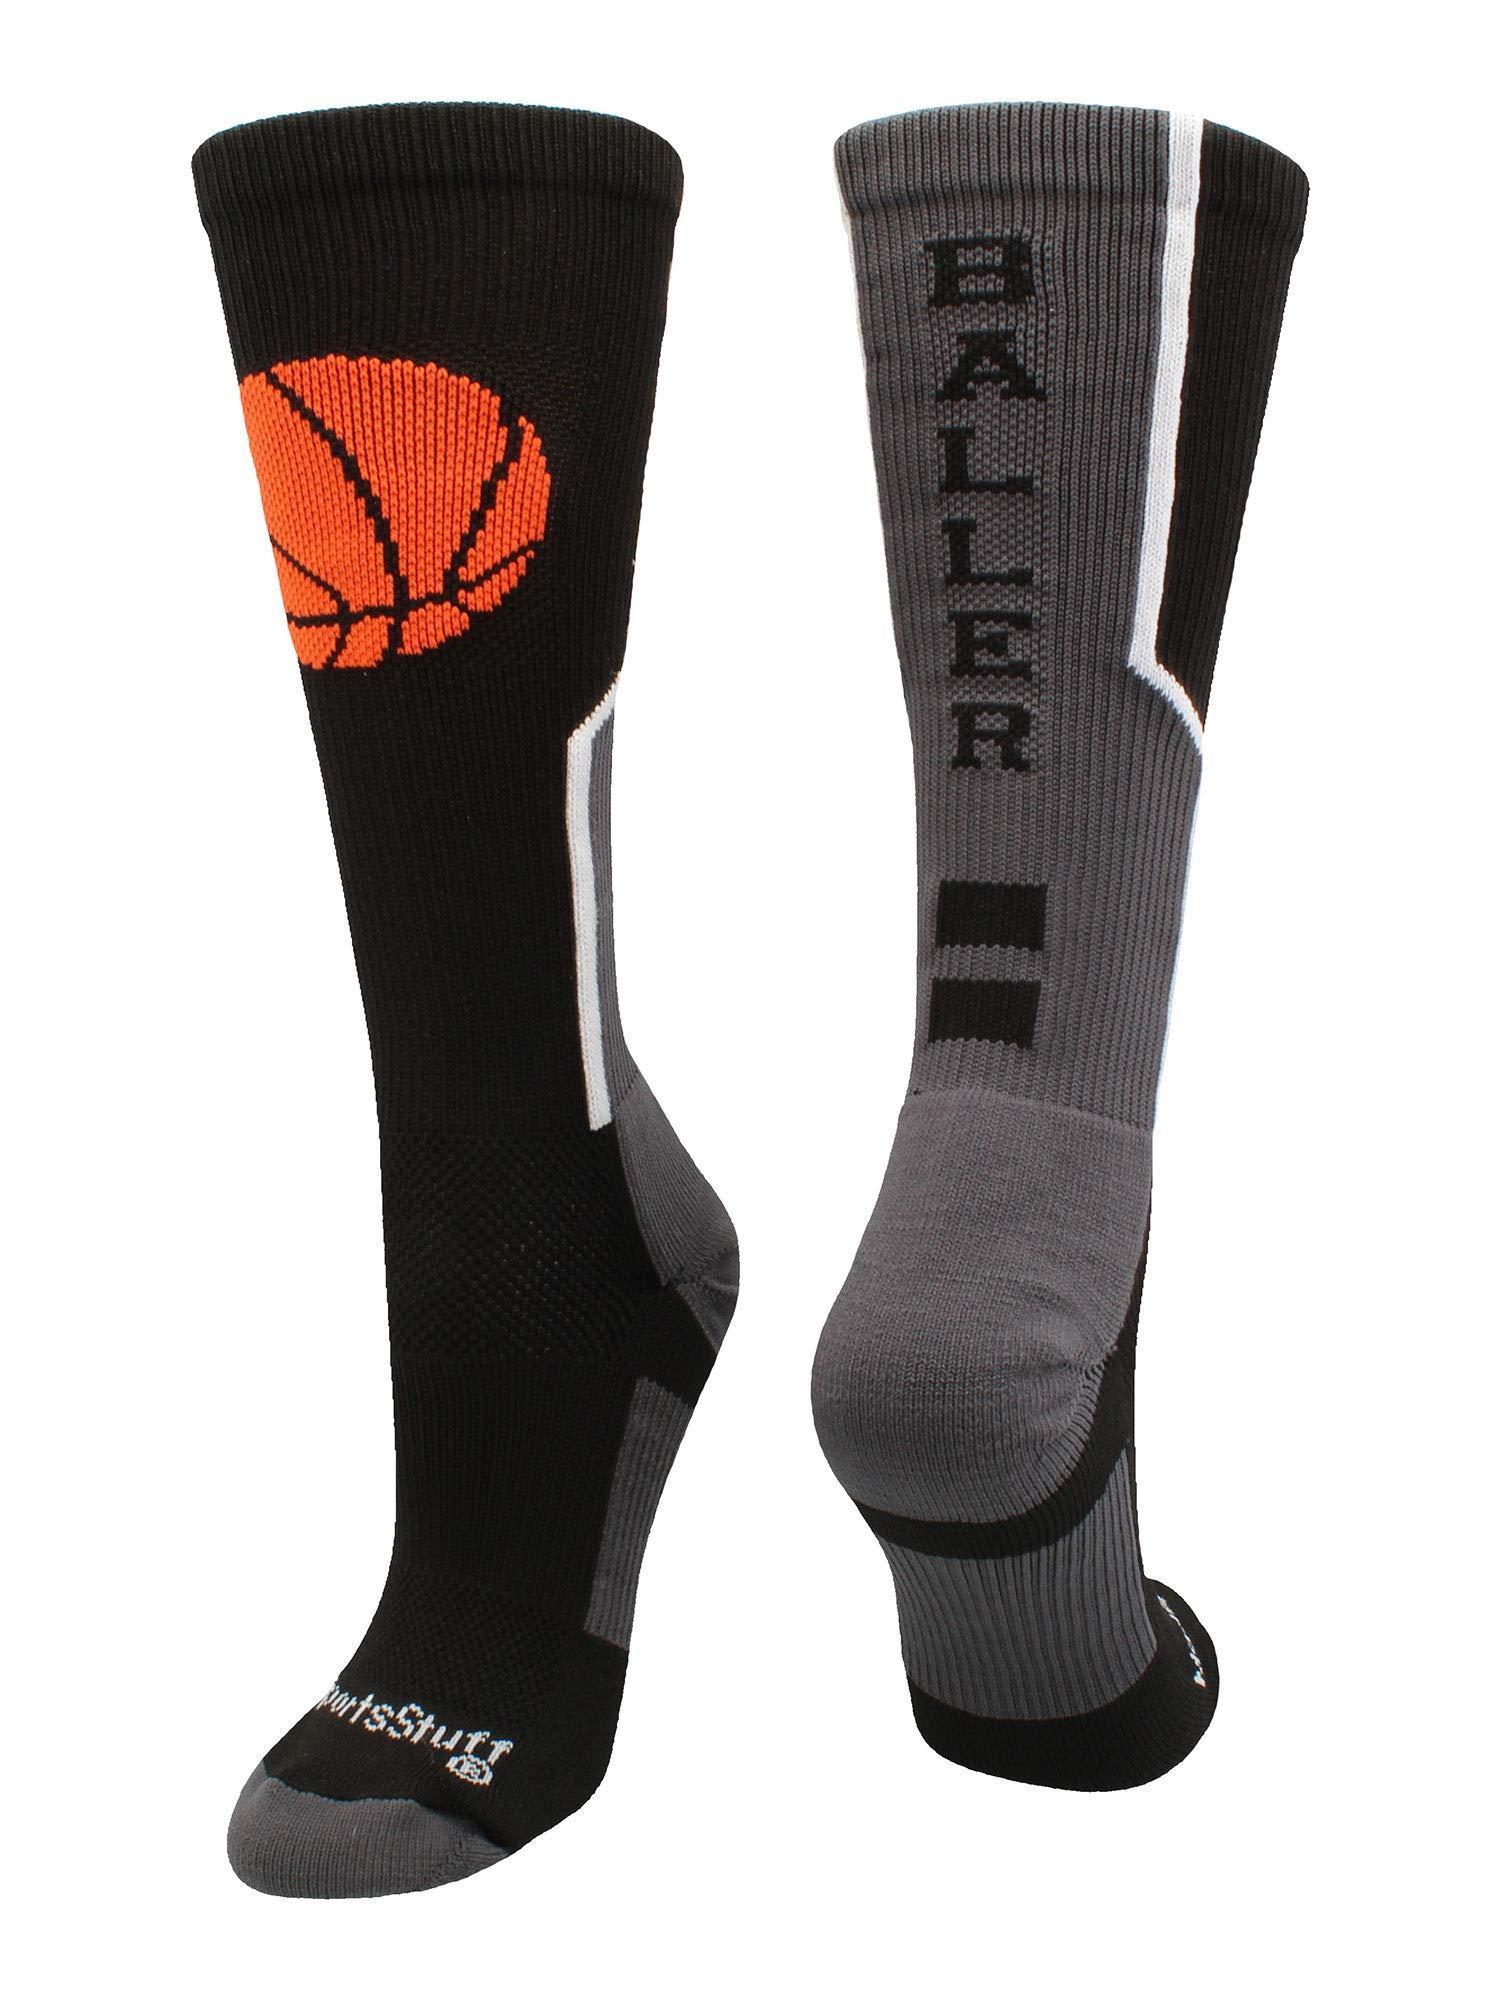 MadSportsStuff Baller Basketball Logo Crew Socks (Black/Orange, Small)